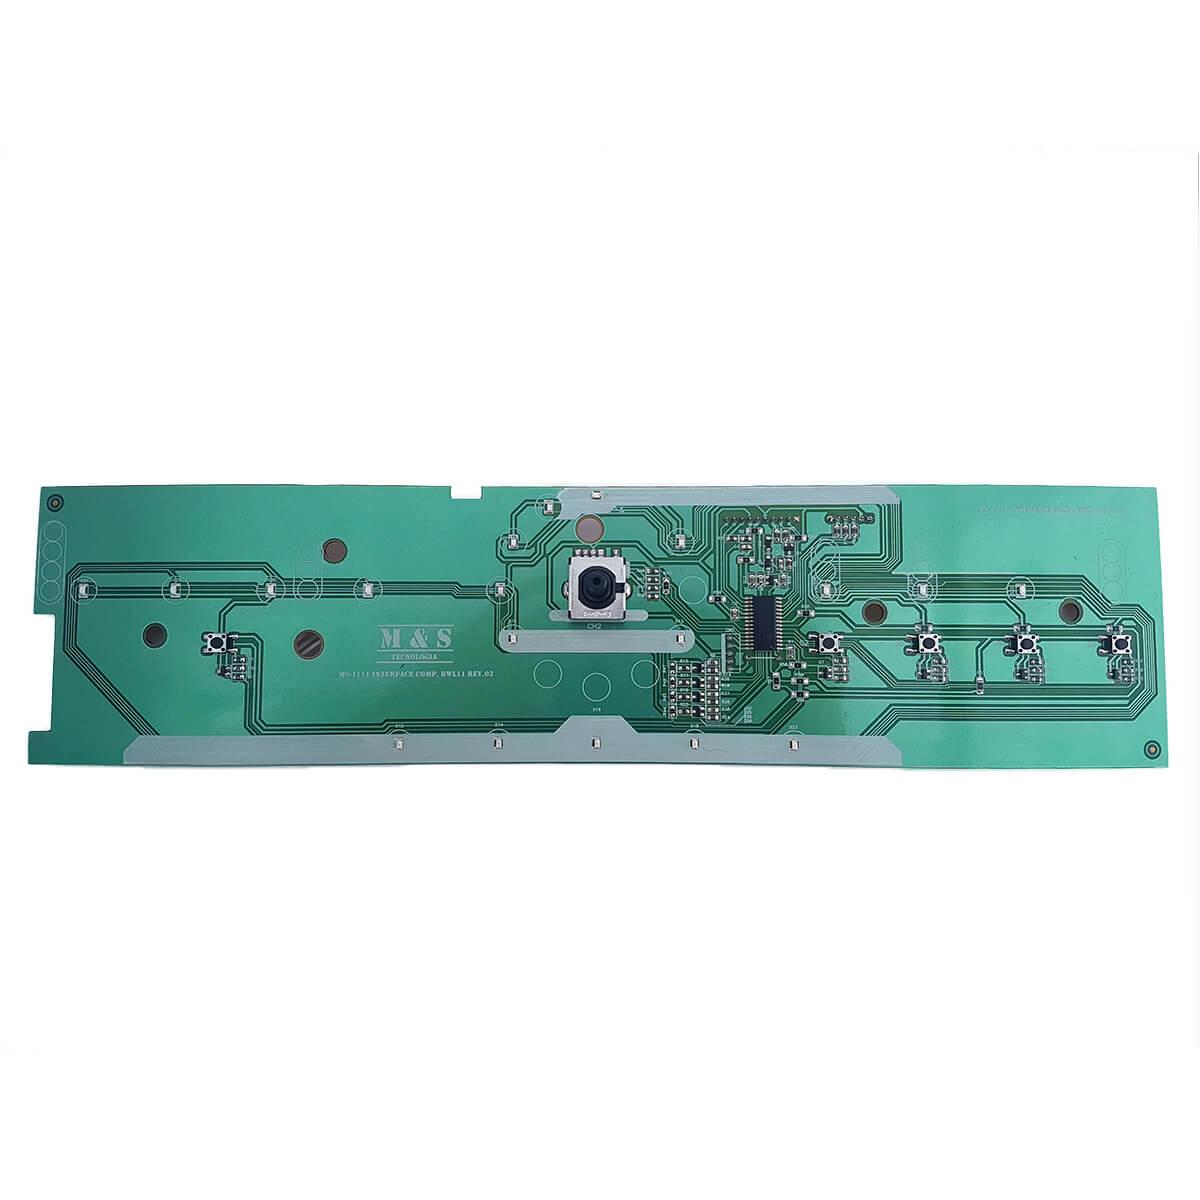 Placa Interface Led Azul Bivolt Para Máquina De Lavar Roupas Brastemp BWL11 BWB11 M&S - 326064442 w10301604 w10356413